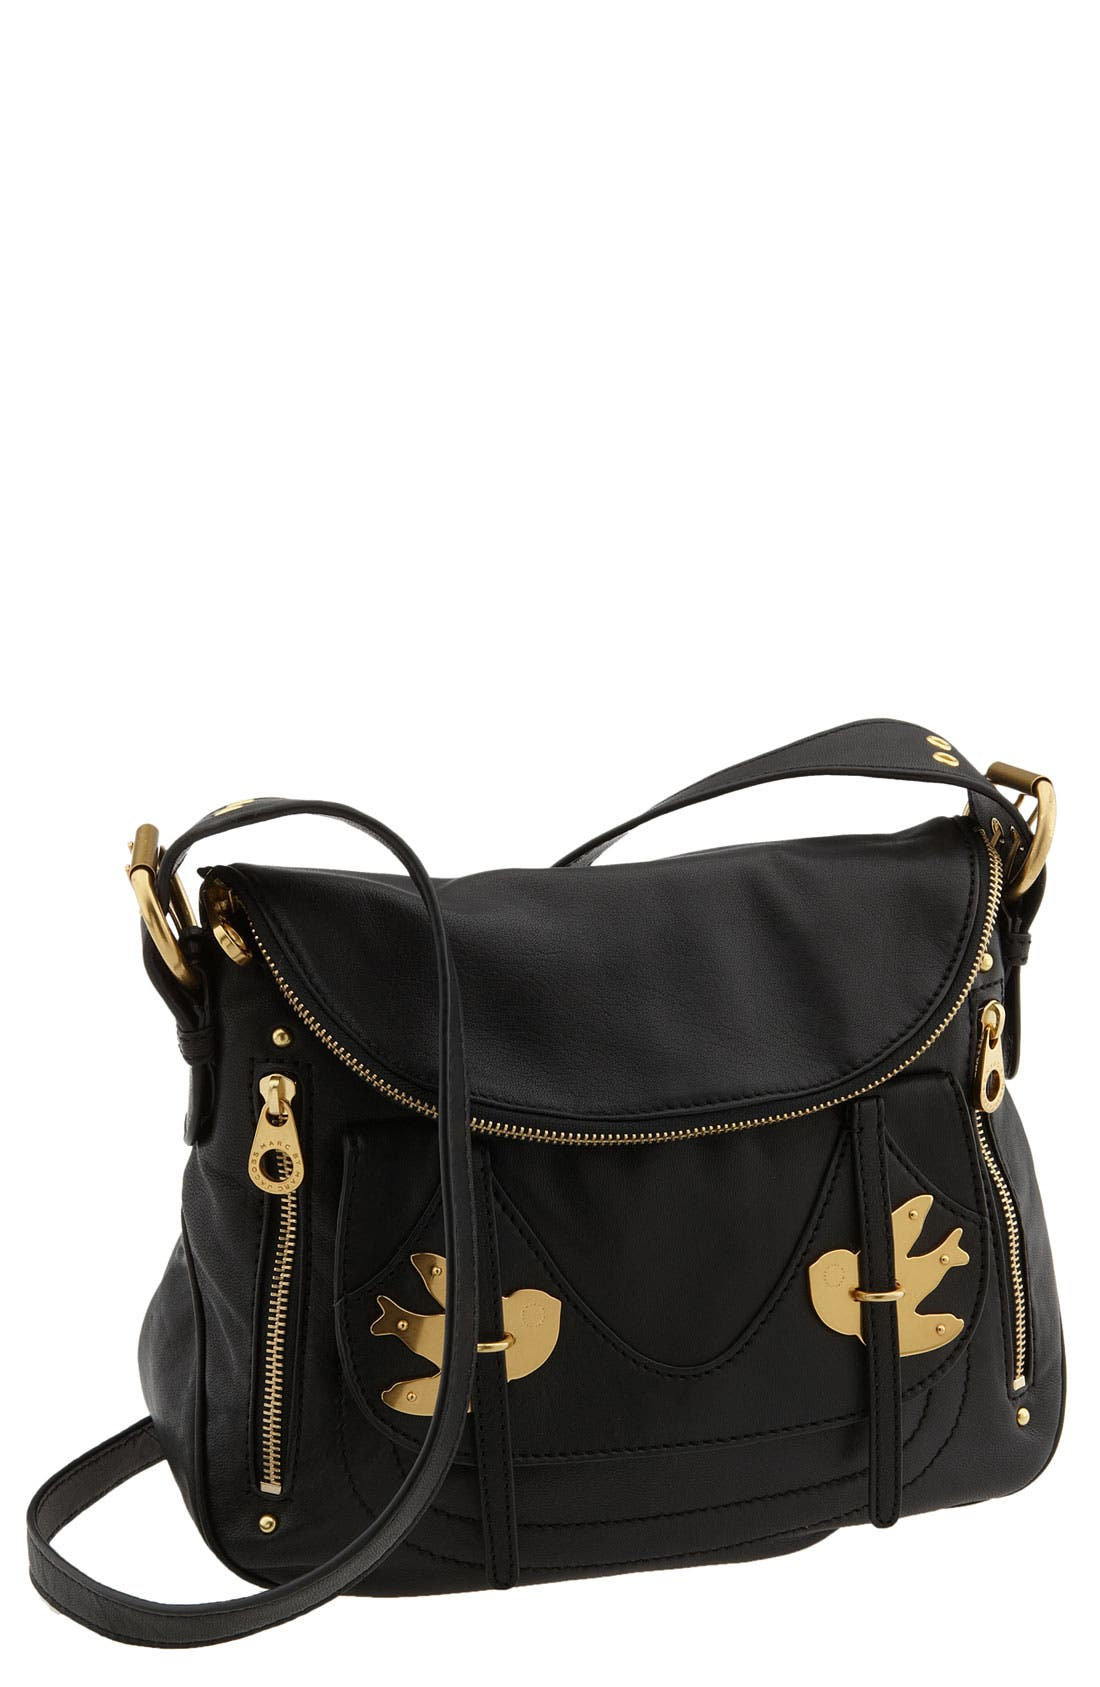 MARC BY MARC JACOBS 'Petal to the Metal - Natasha' Flap Crossbody Bag, Medium, Main, color, 001